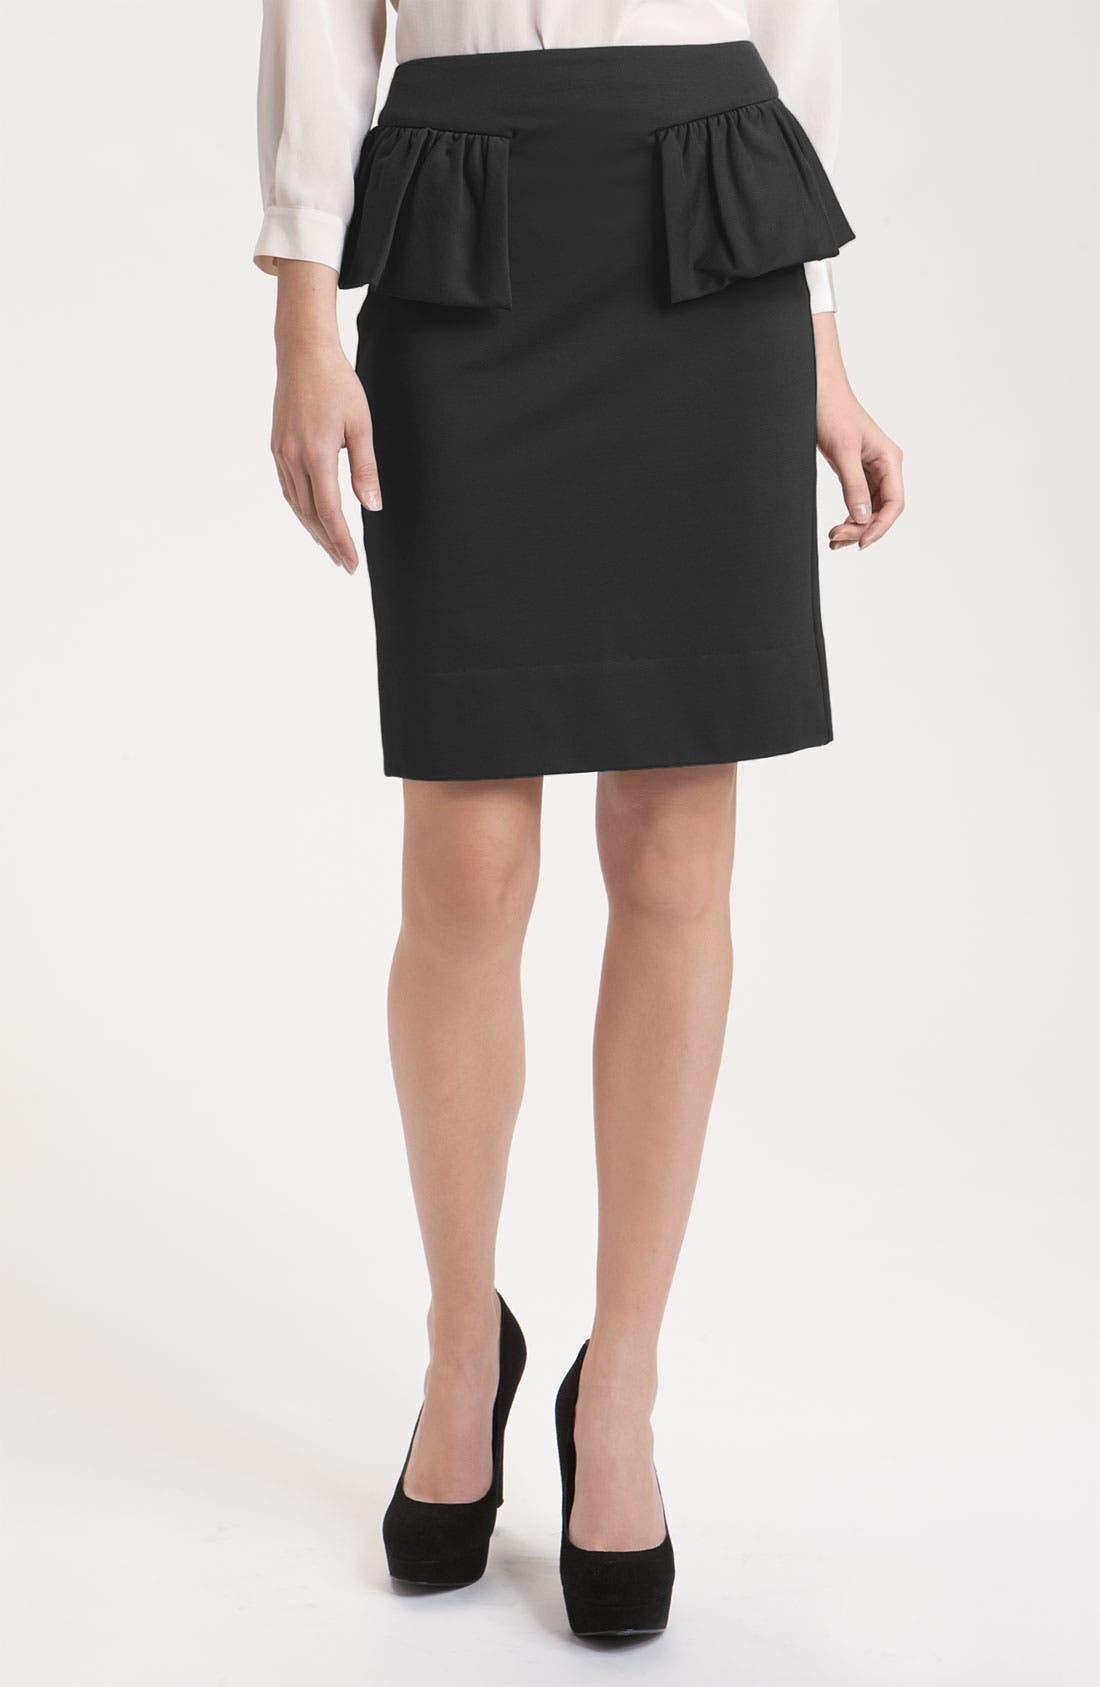 Alternate Image 1 Selected - MARC BY MARC JACOBS 'Hannah' Jersey Ruffle Peplum Skirt